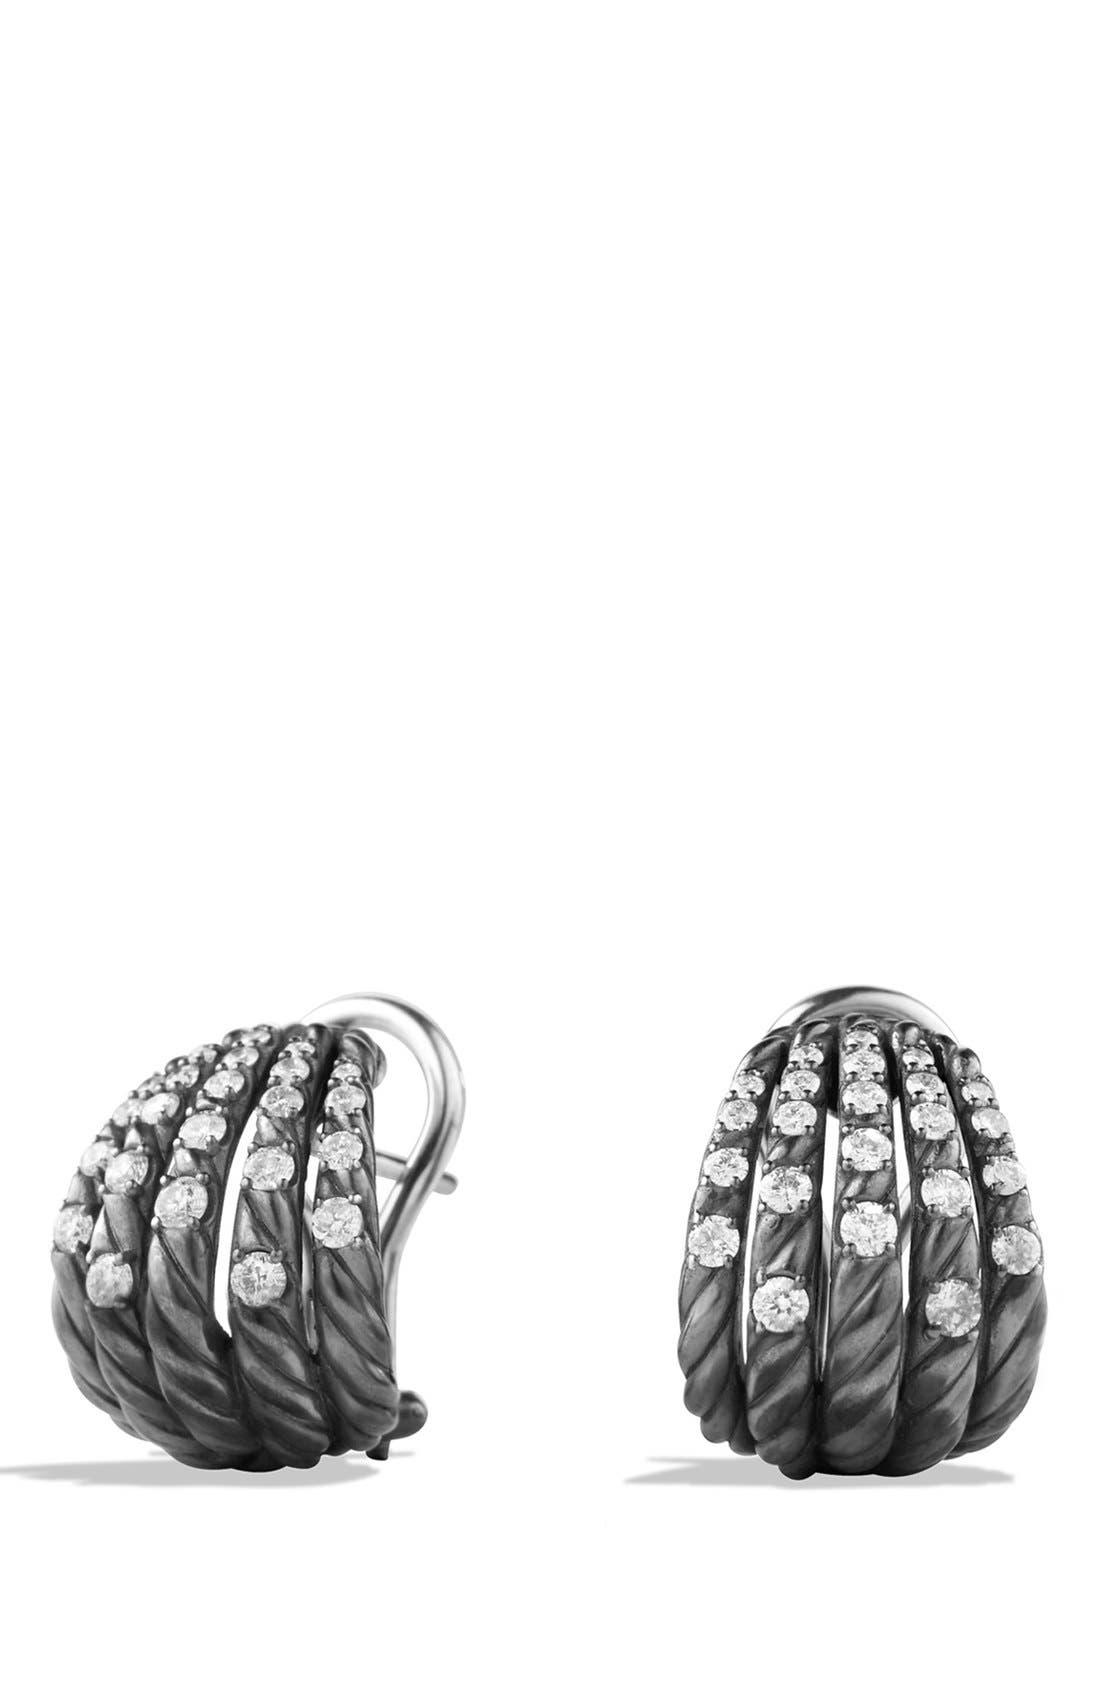 DAVID YURMAN Tempo Earrings with Diamonds